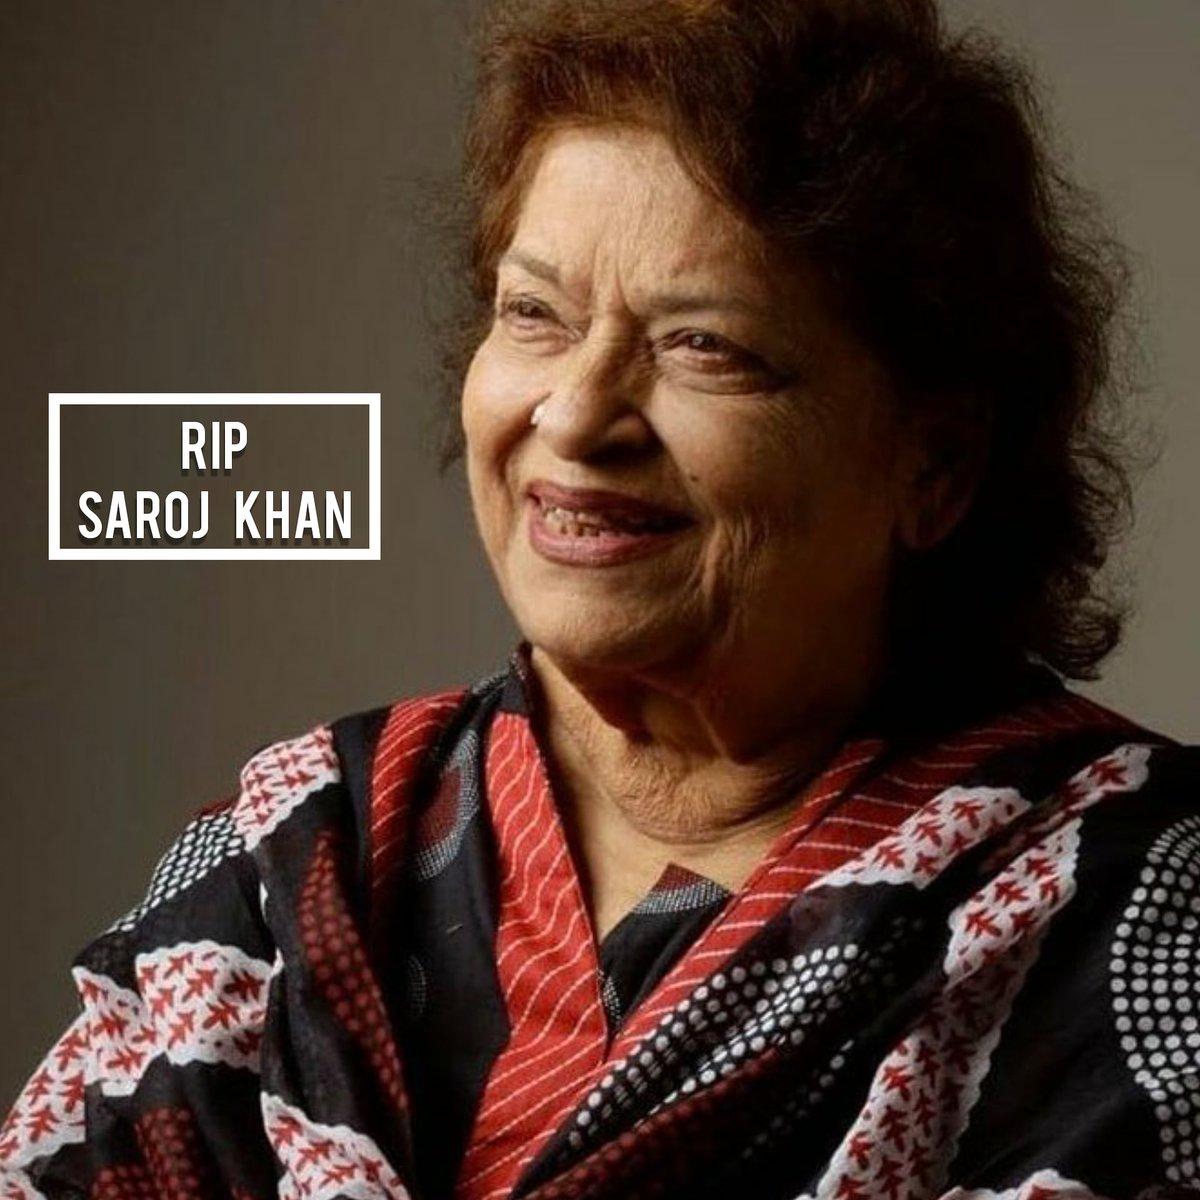 Another legend leaves us🙏 #SarojKhan https://t.co/KwpENUY0Lp